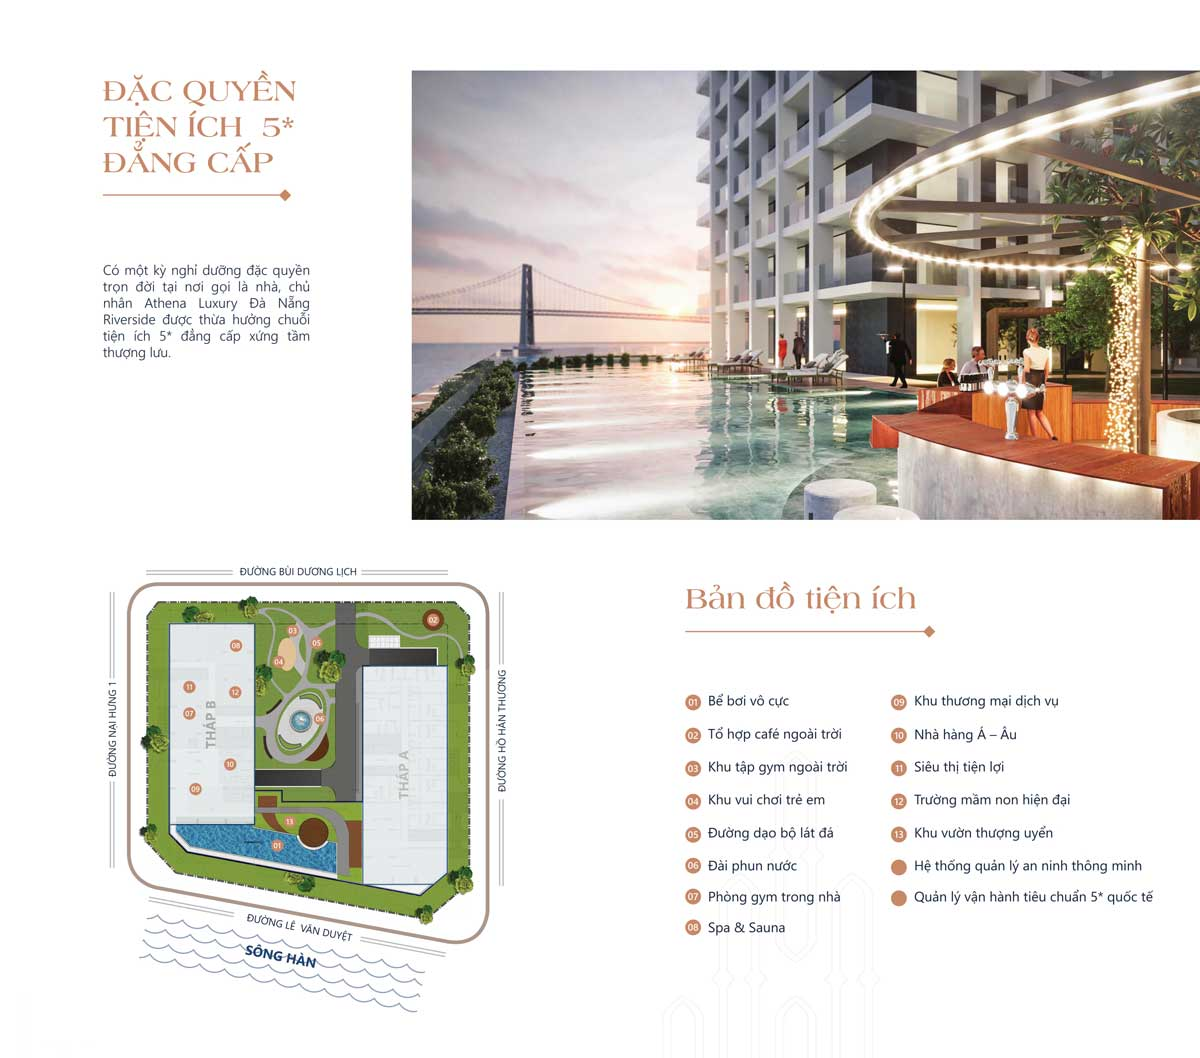 he thong tien ich noi khu tai du an athena luxury da nang riverside - Athena Luxury Đà Nẵng Riverside